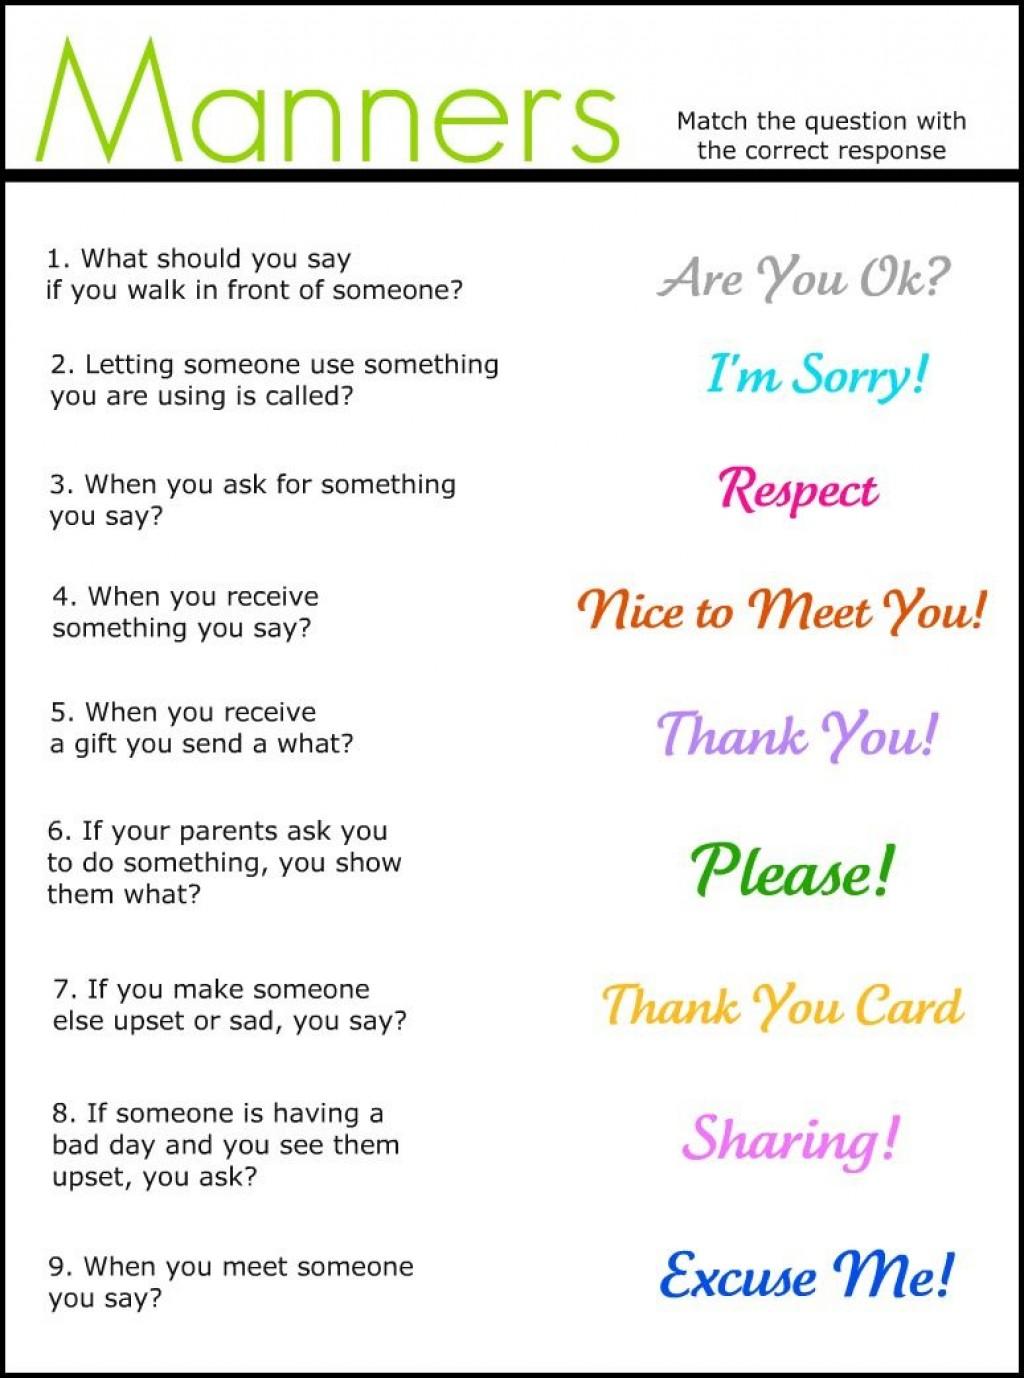 003 Essay Example Basic Table Wonderful Manners Large